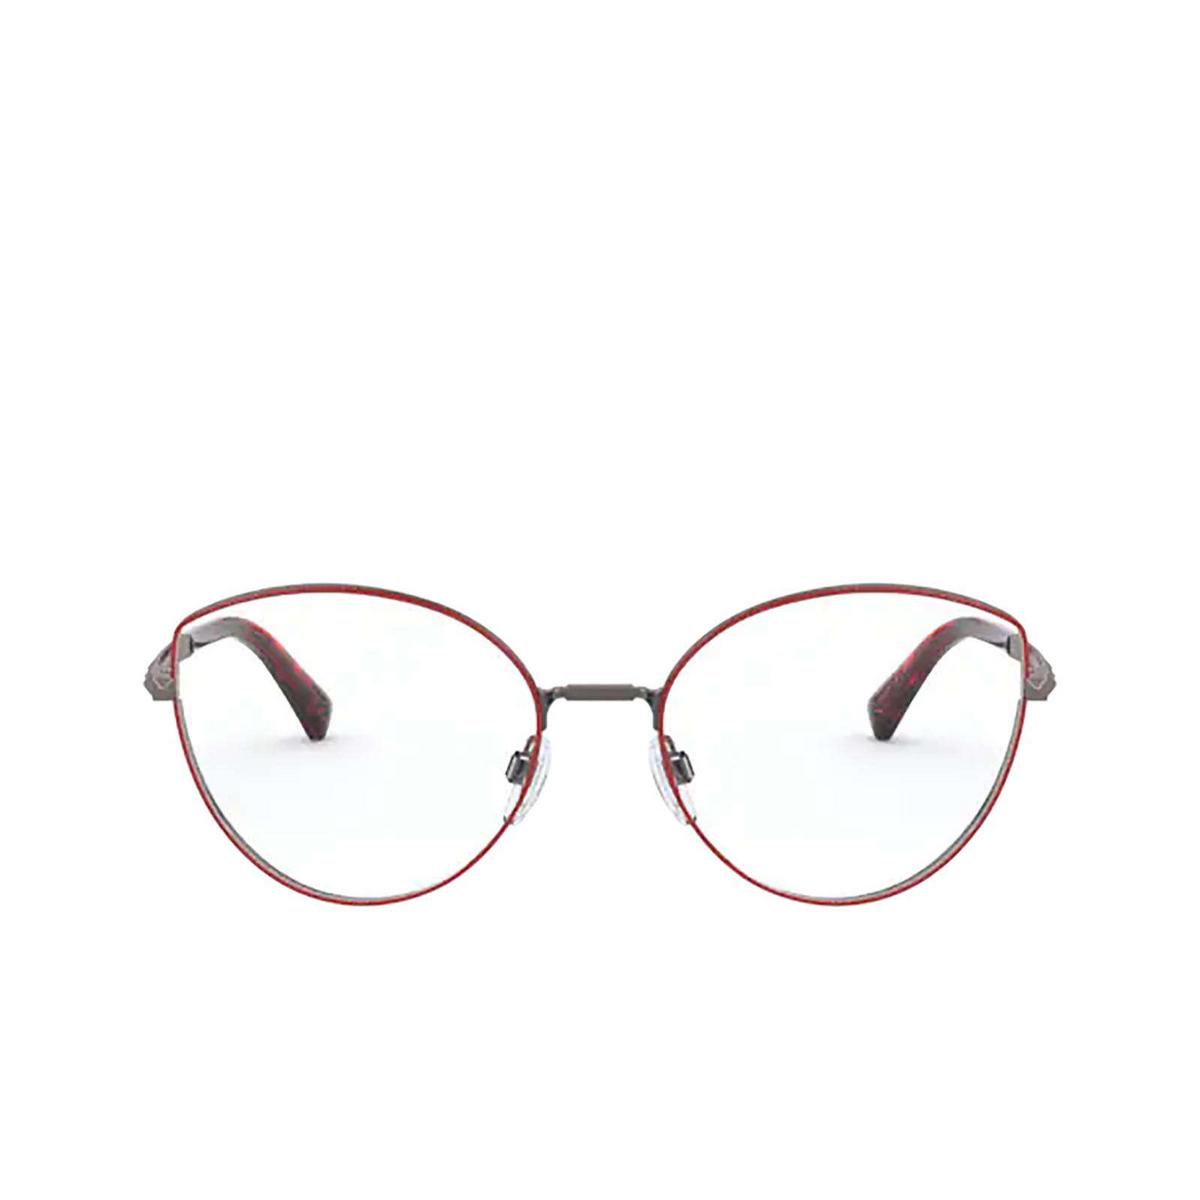 Valentino® Cat-eye Eyeglasses: VA1018 color Gunmetal / Red 3012 - front view.